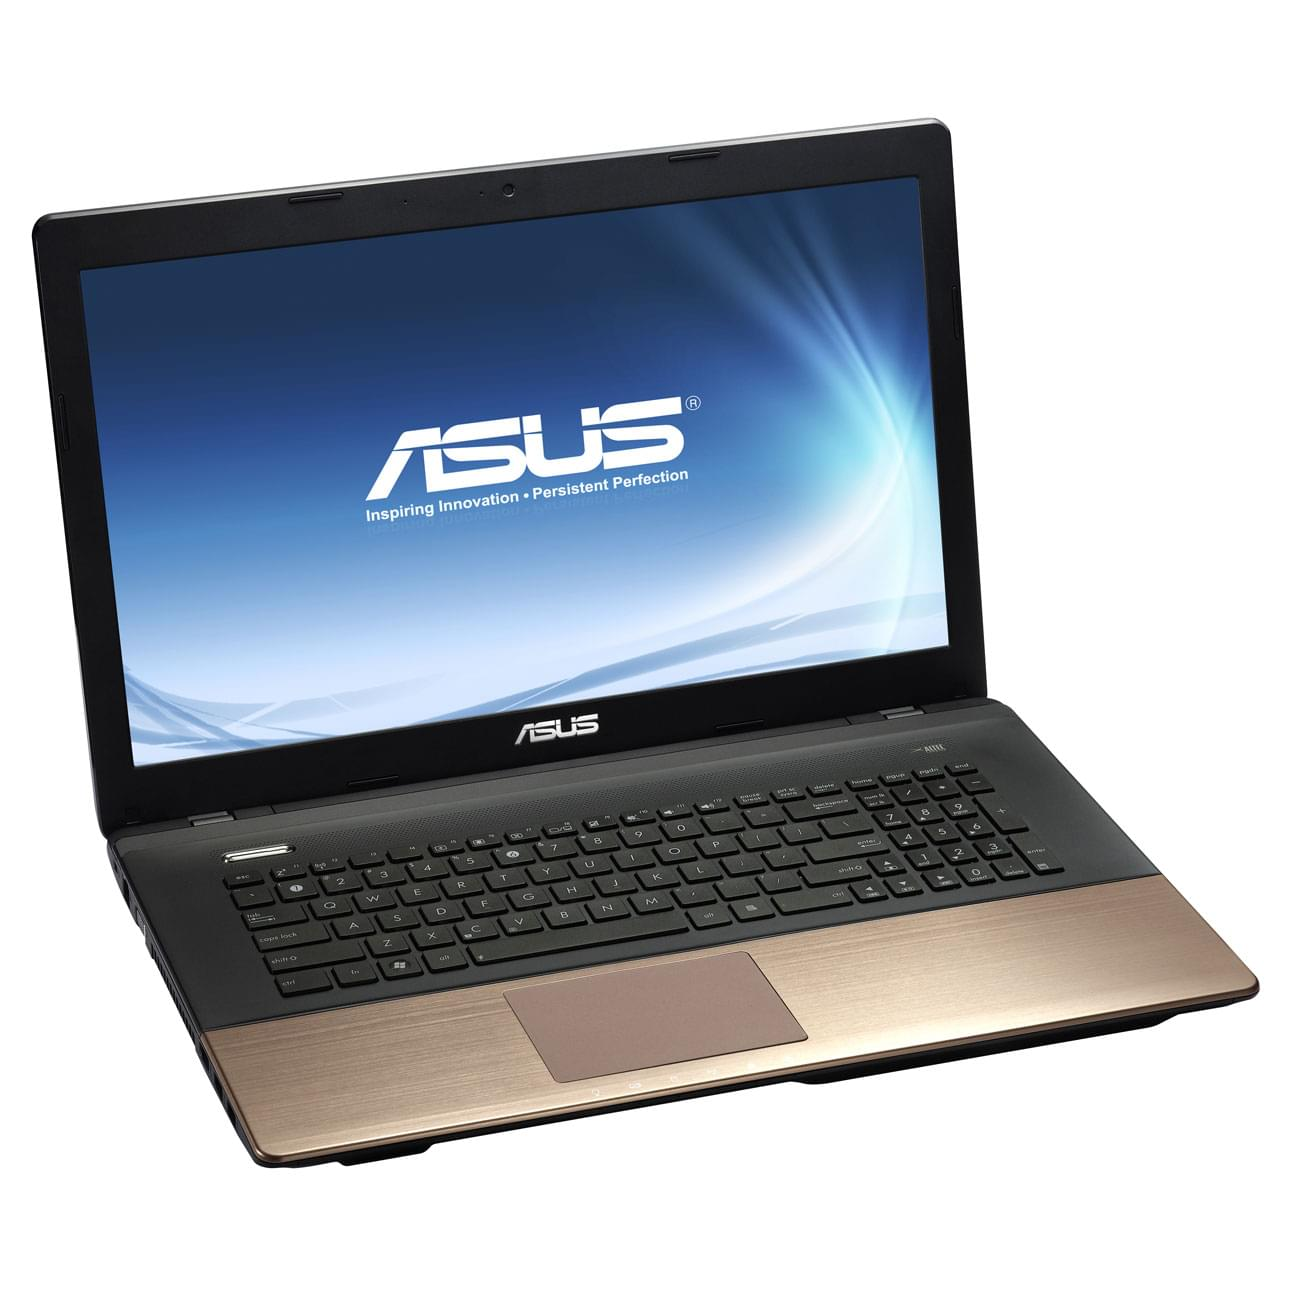 Asus K75VJ-TY046H (K75VJ-TY046H) - Achat / Vente PC Portable sur Cybertek.fr - 0